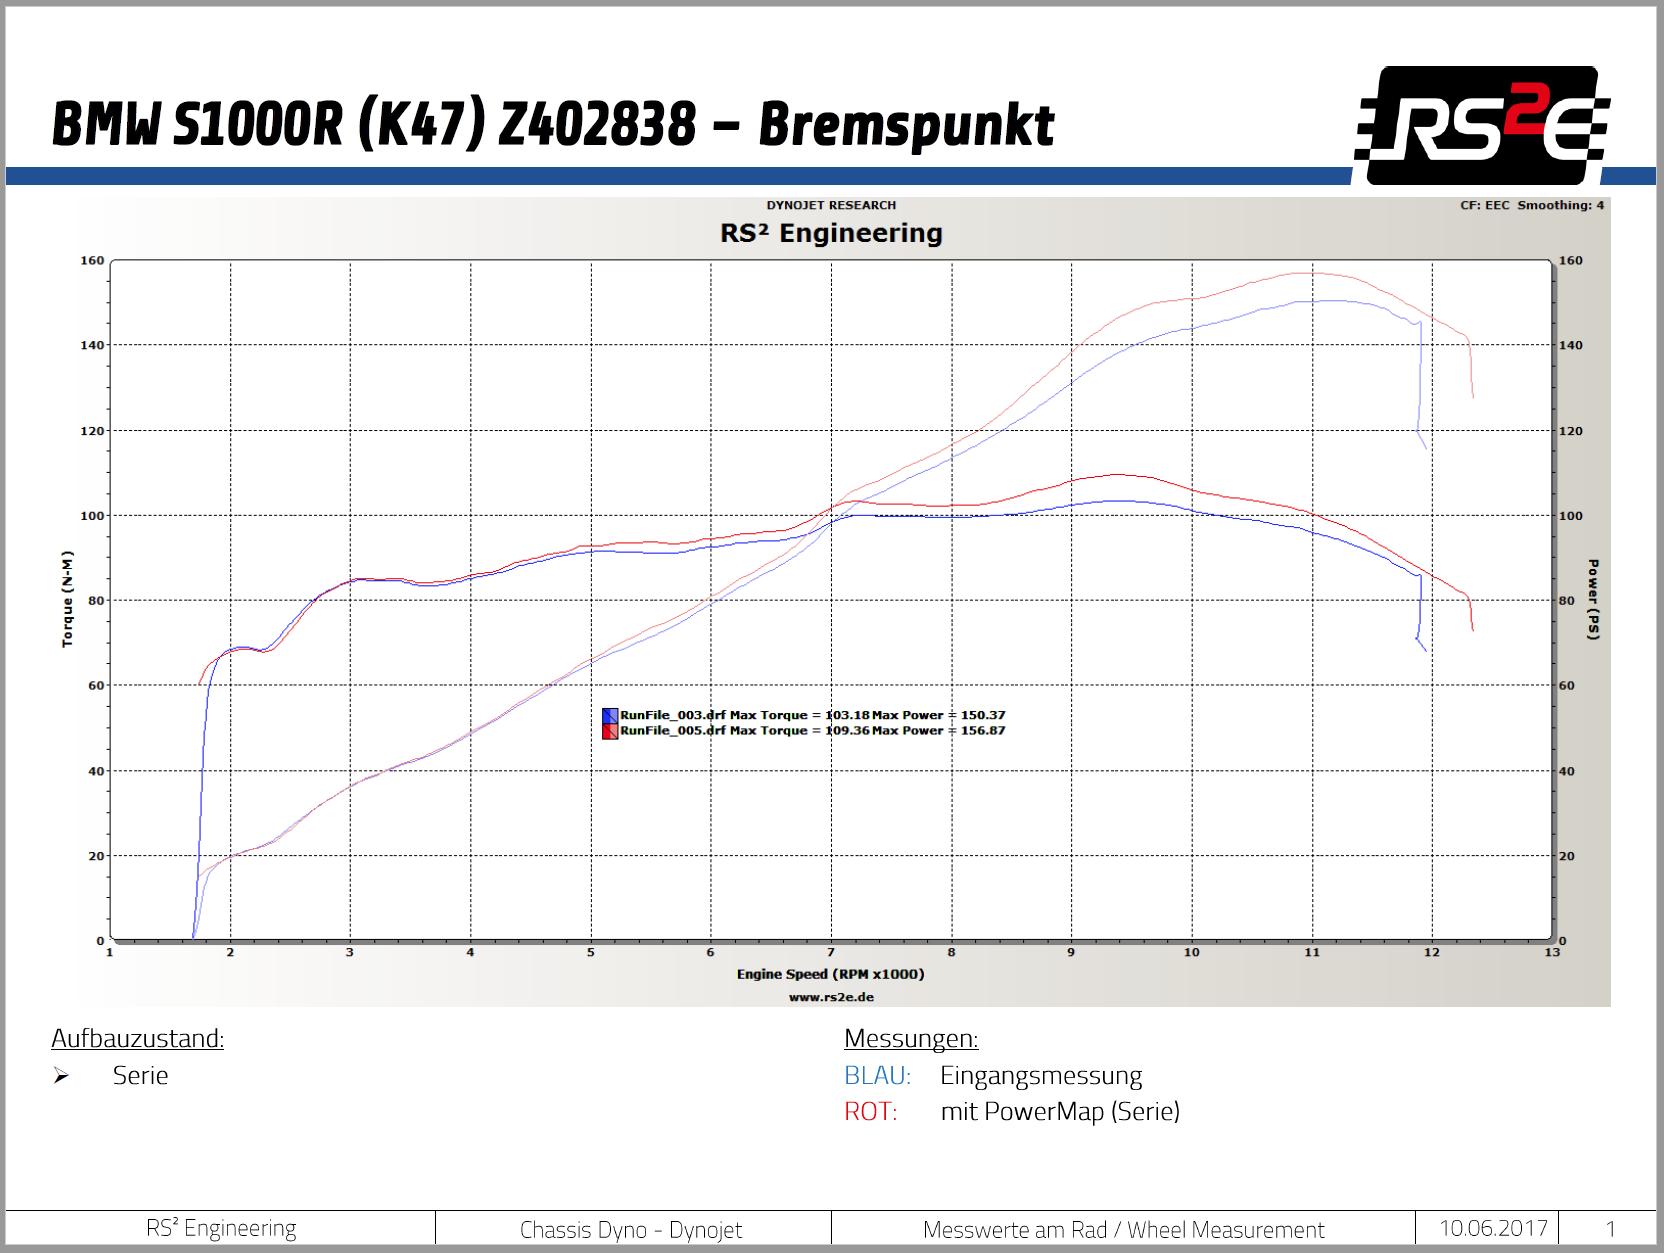 Powermapping Tuning Fur Bmw S1000r Bremspunkt